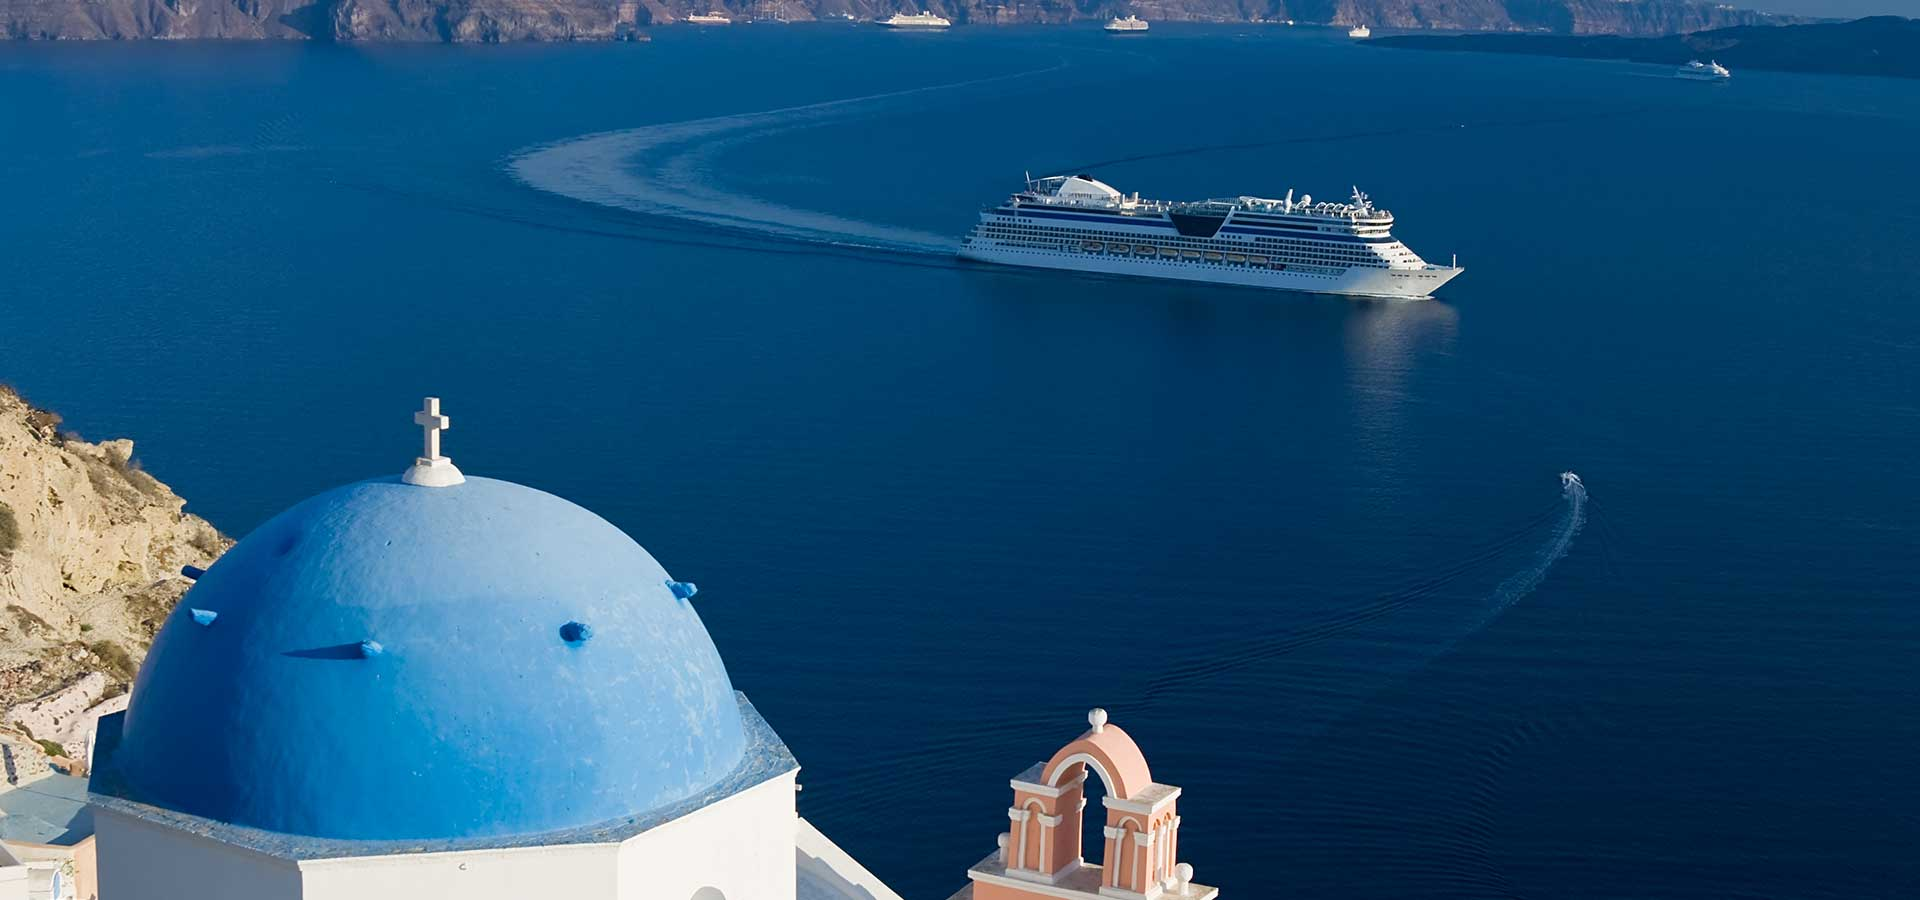 Iles grecques-Santorin